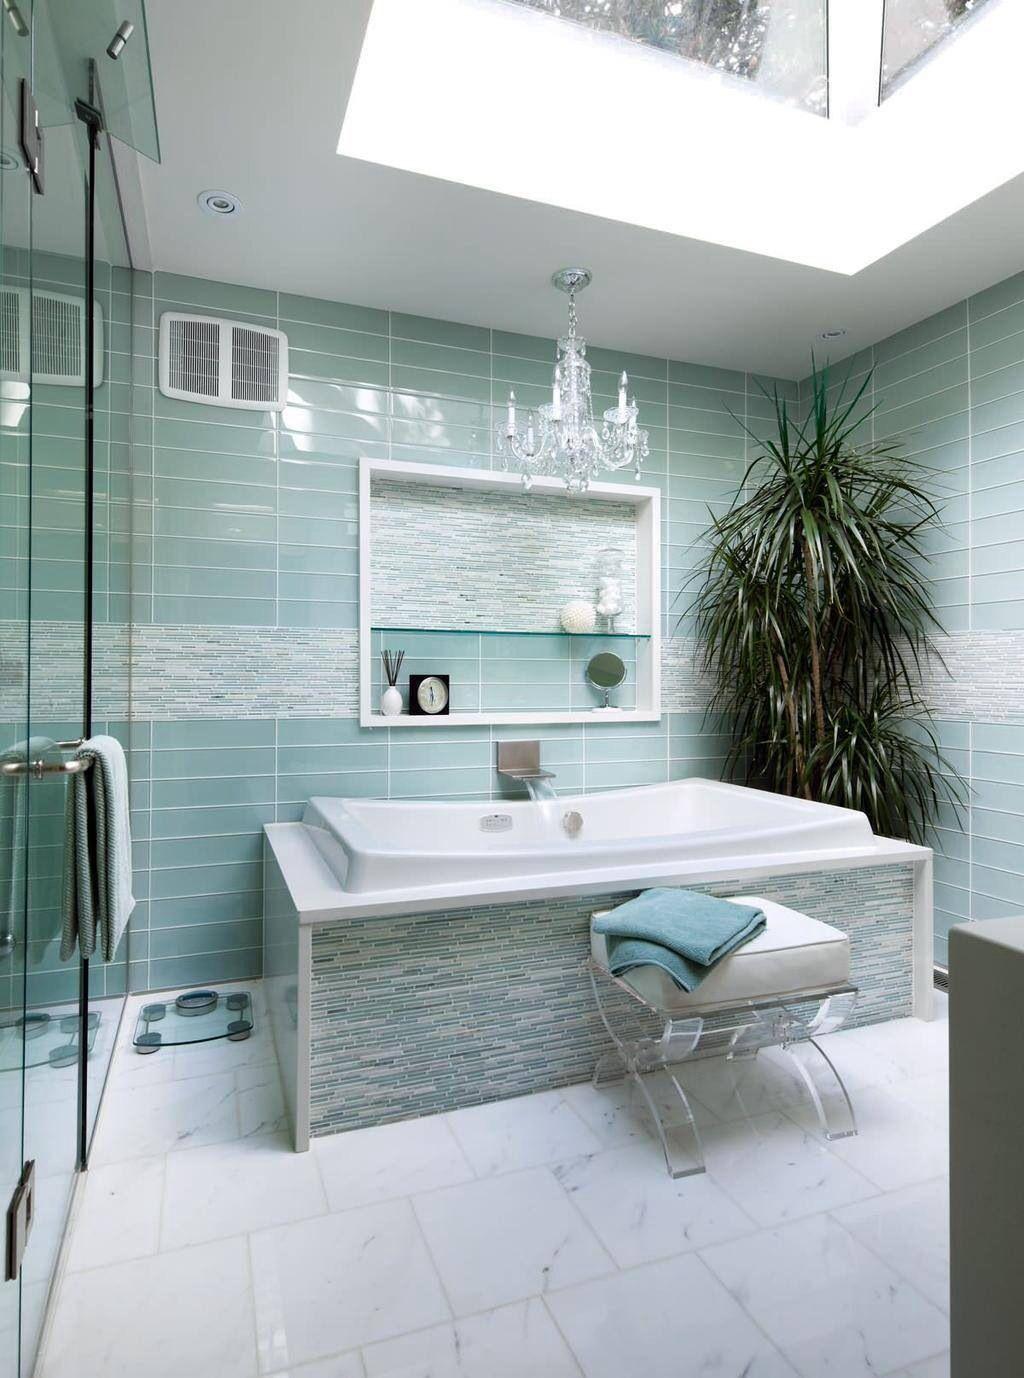 Tranquil bathroom | Home Decor | Pinterest | Tranquil bathroom, Tubs ...